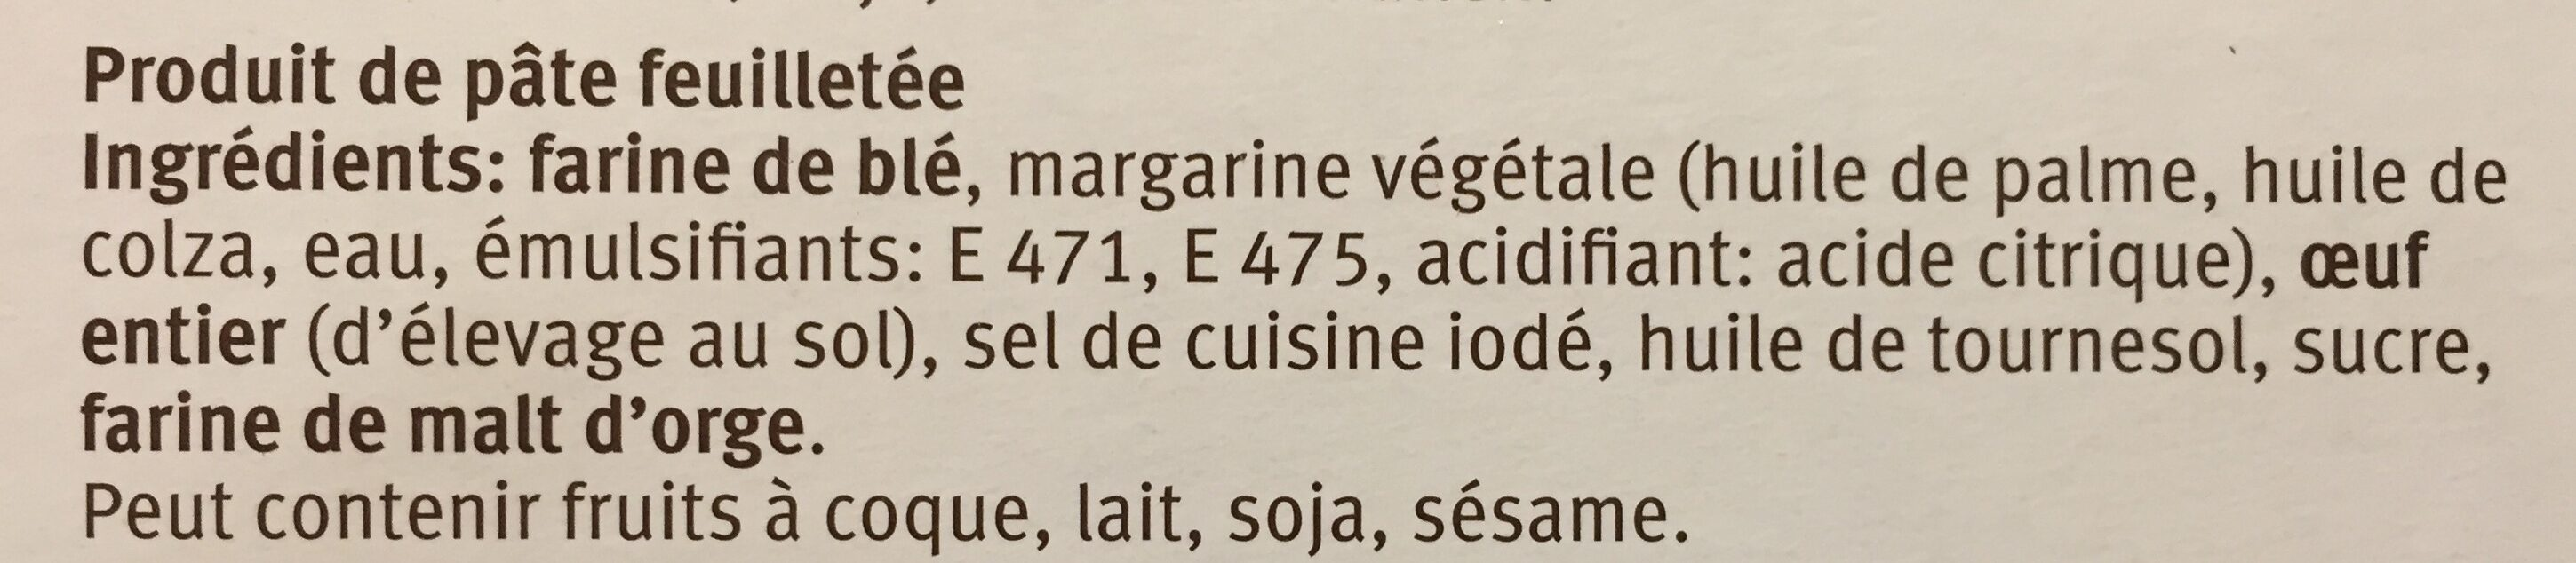 Migros Pastetli - Ingrédients - fr